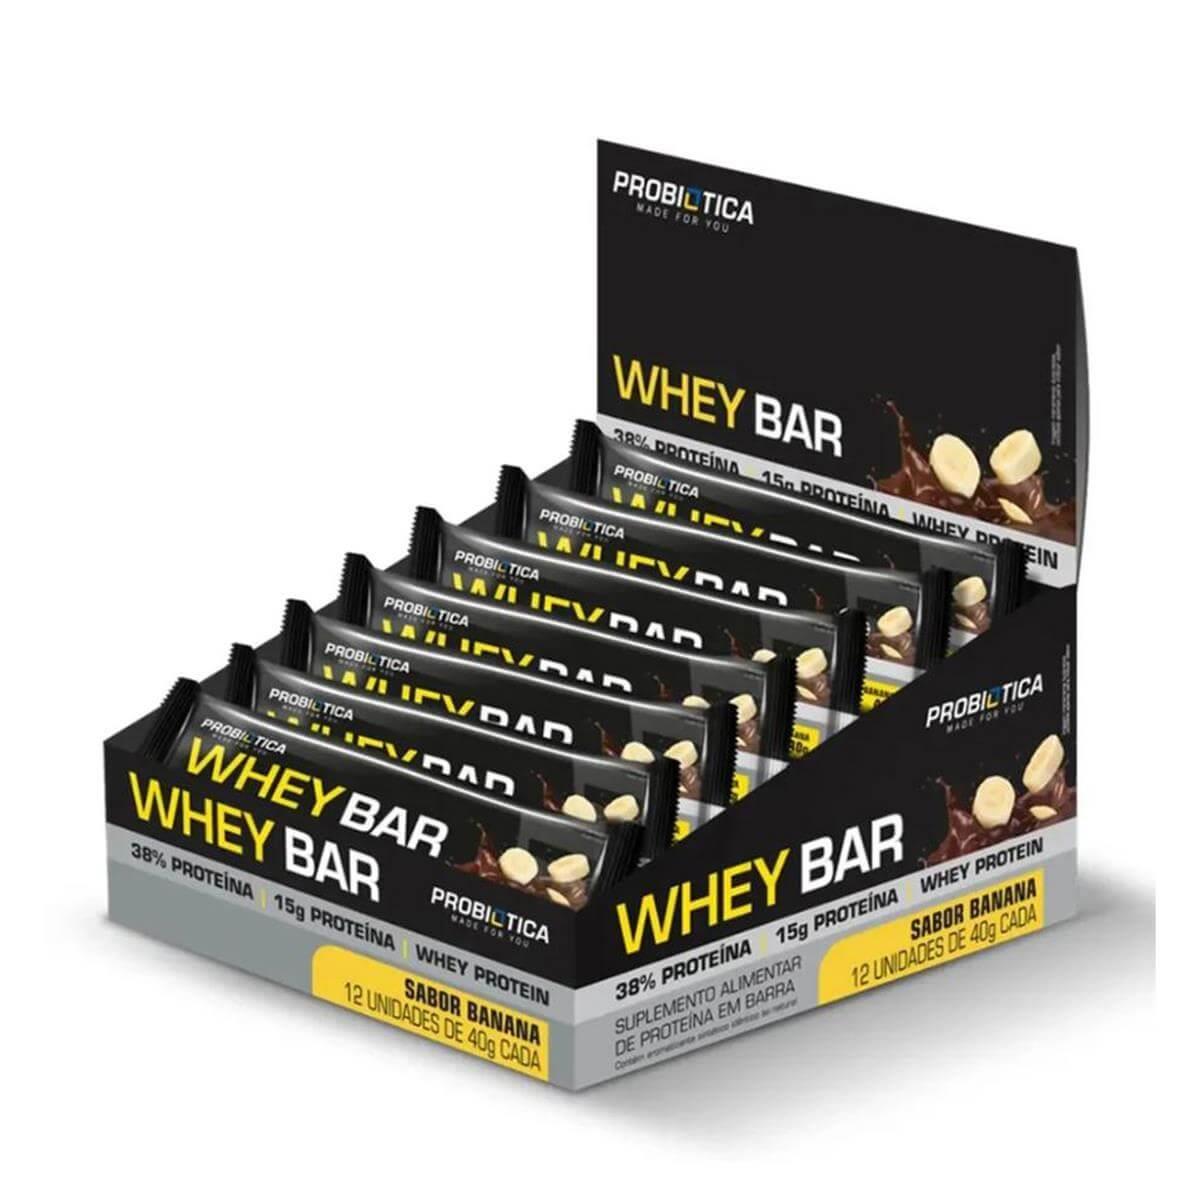 WHEY BAR (480g) - Banana - Probiótica